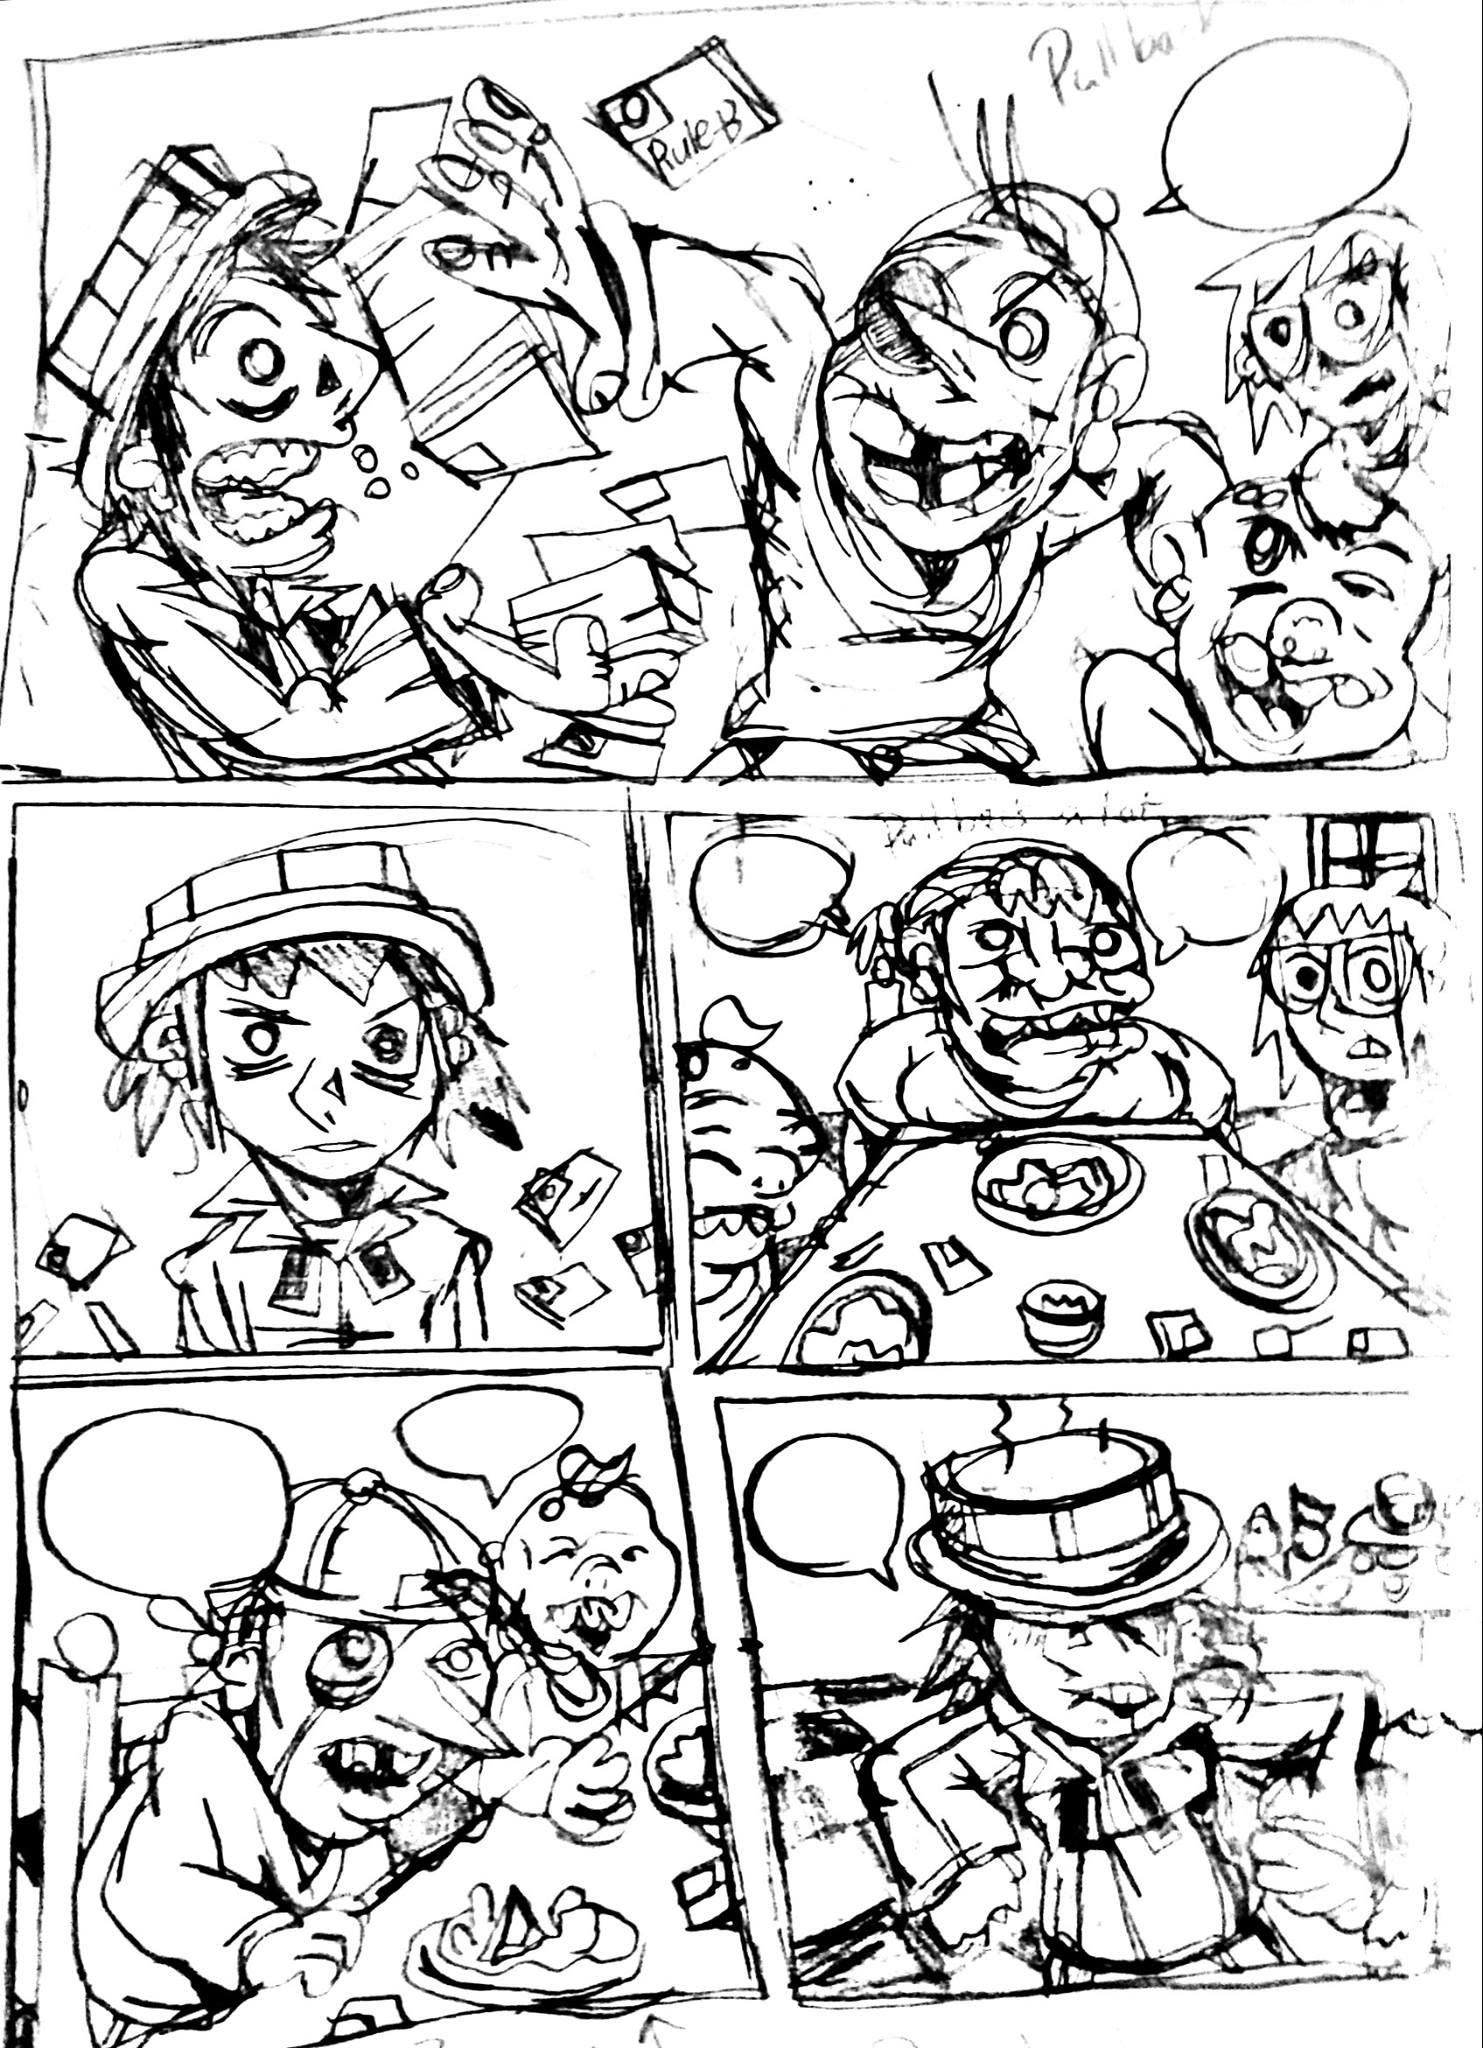 RULE-BREAKER comic random draft page 2